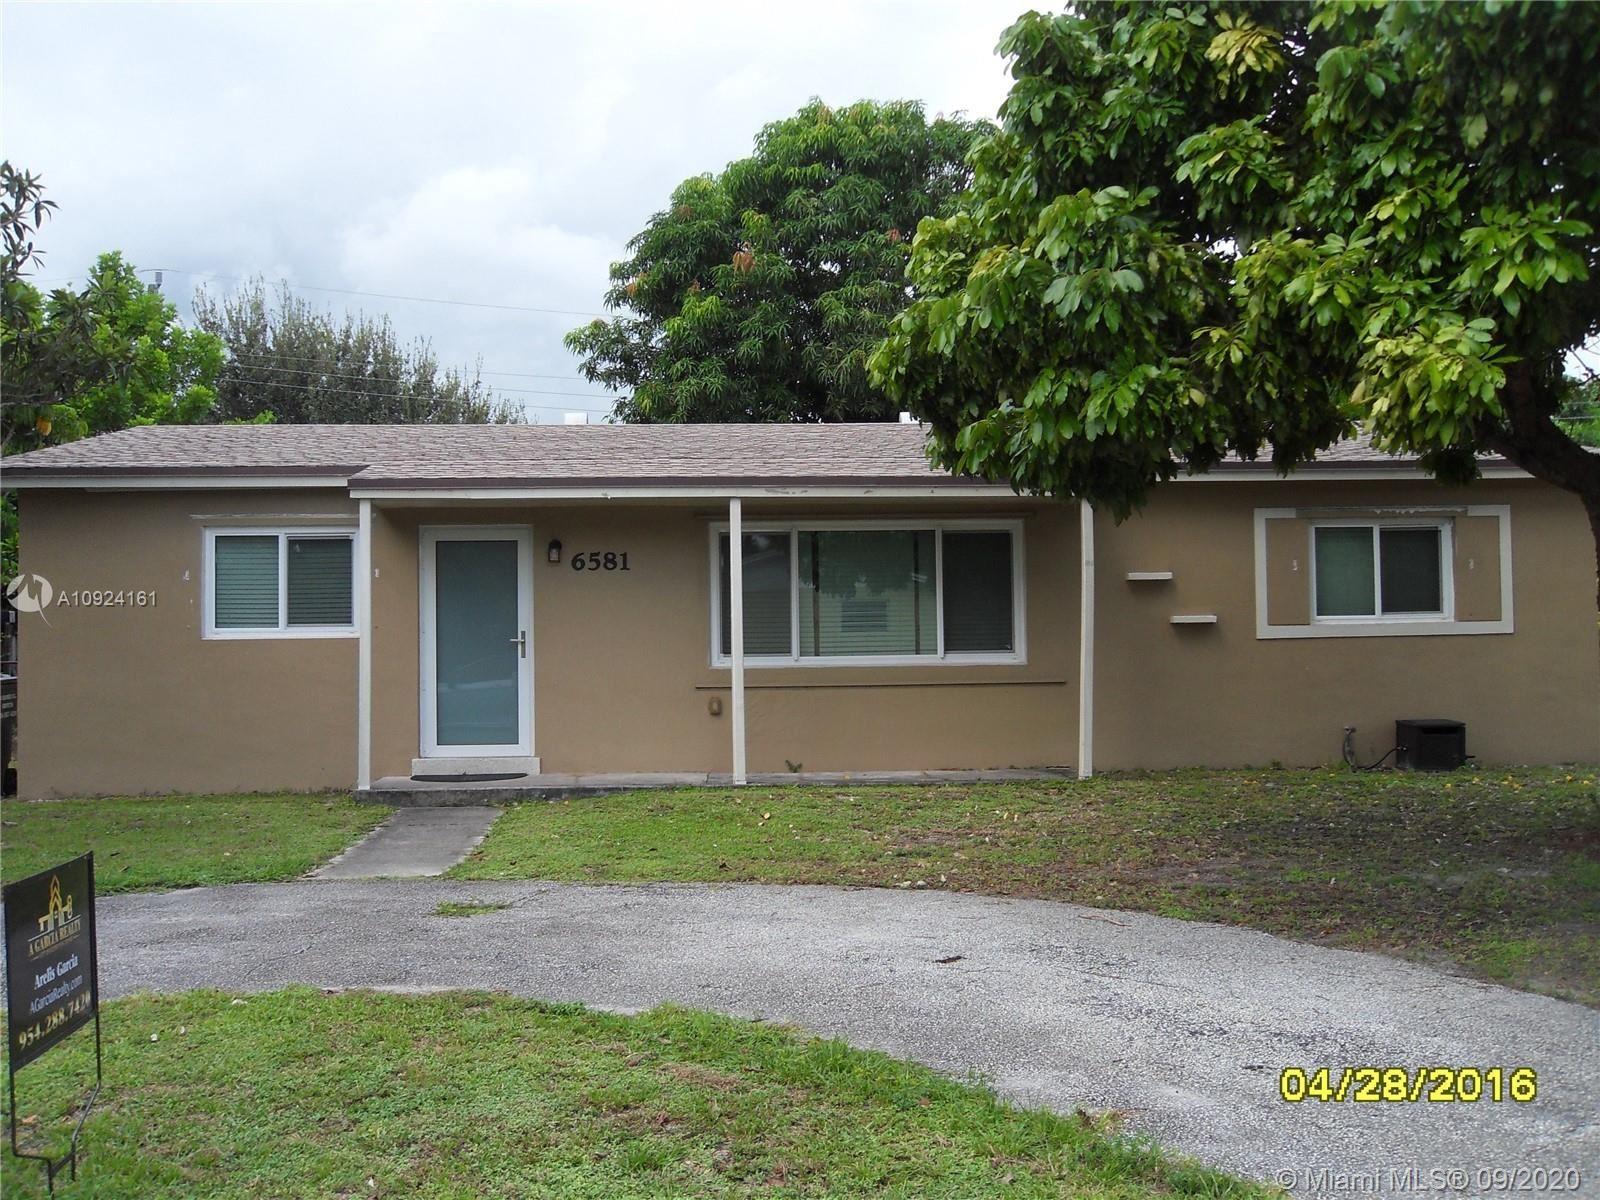 6581 Taylor St, Hollywood, FL 33024 - #: A10924161